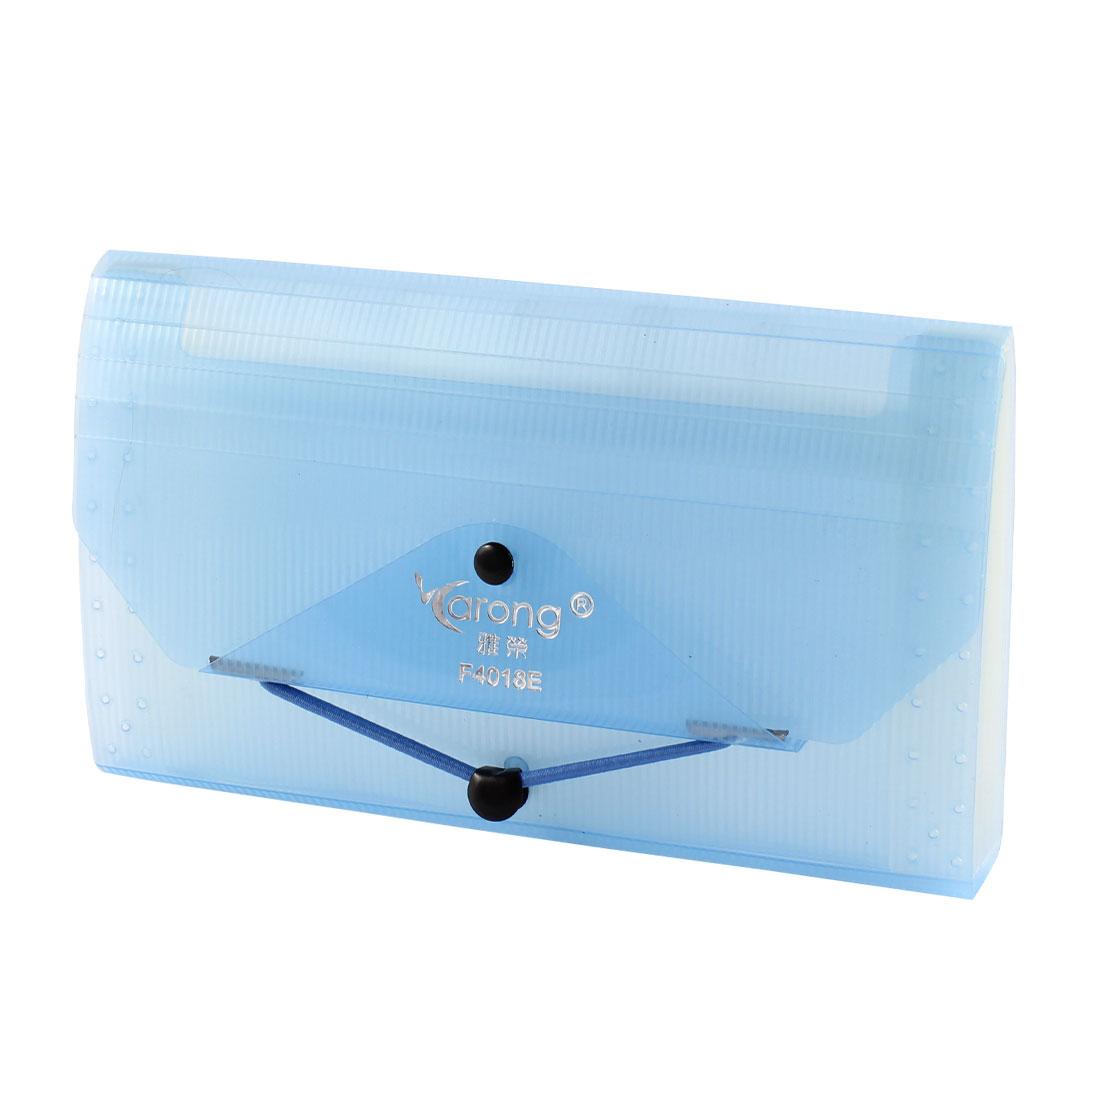 Elastic Strap Closure 13 Compartments Blue Plastic Expanding File Folder Bills Receipt Card Holder